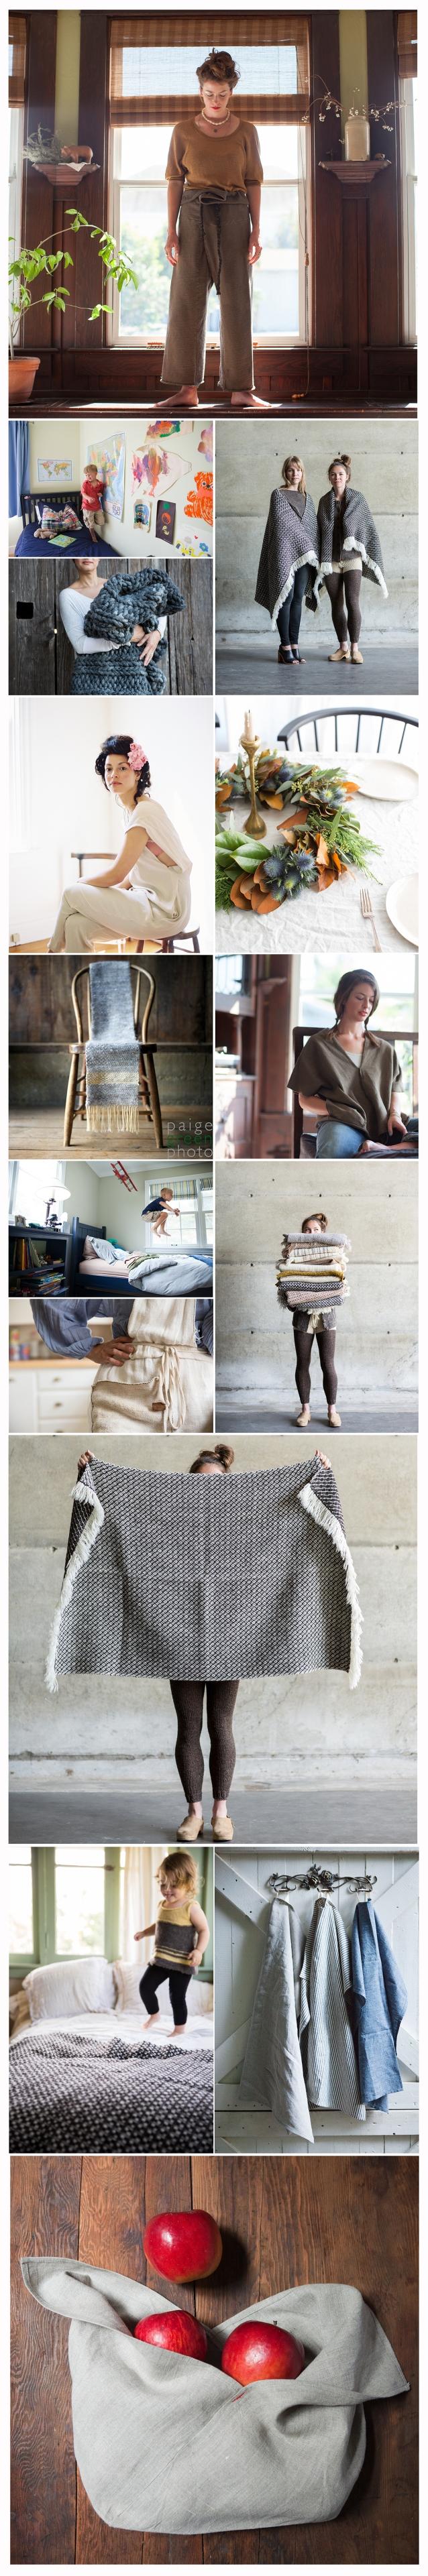 PaigeGreen-textiles-M2.0S